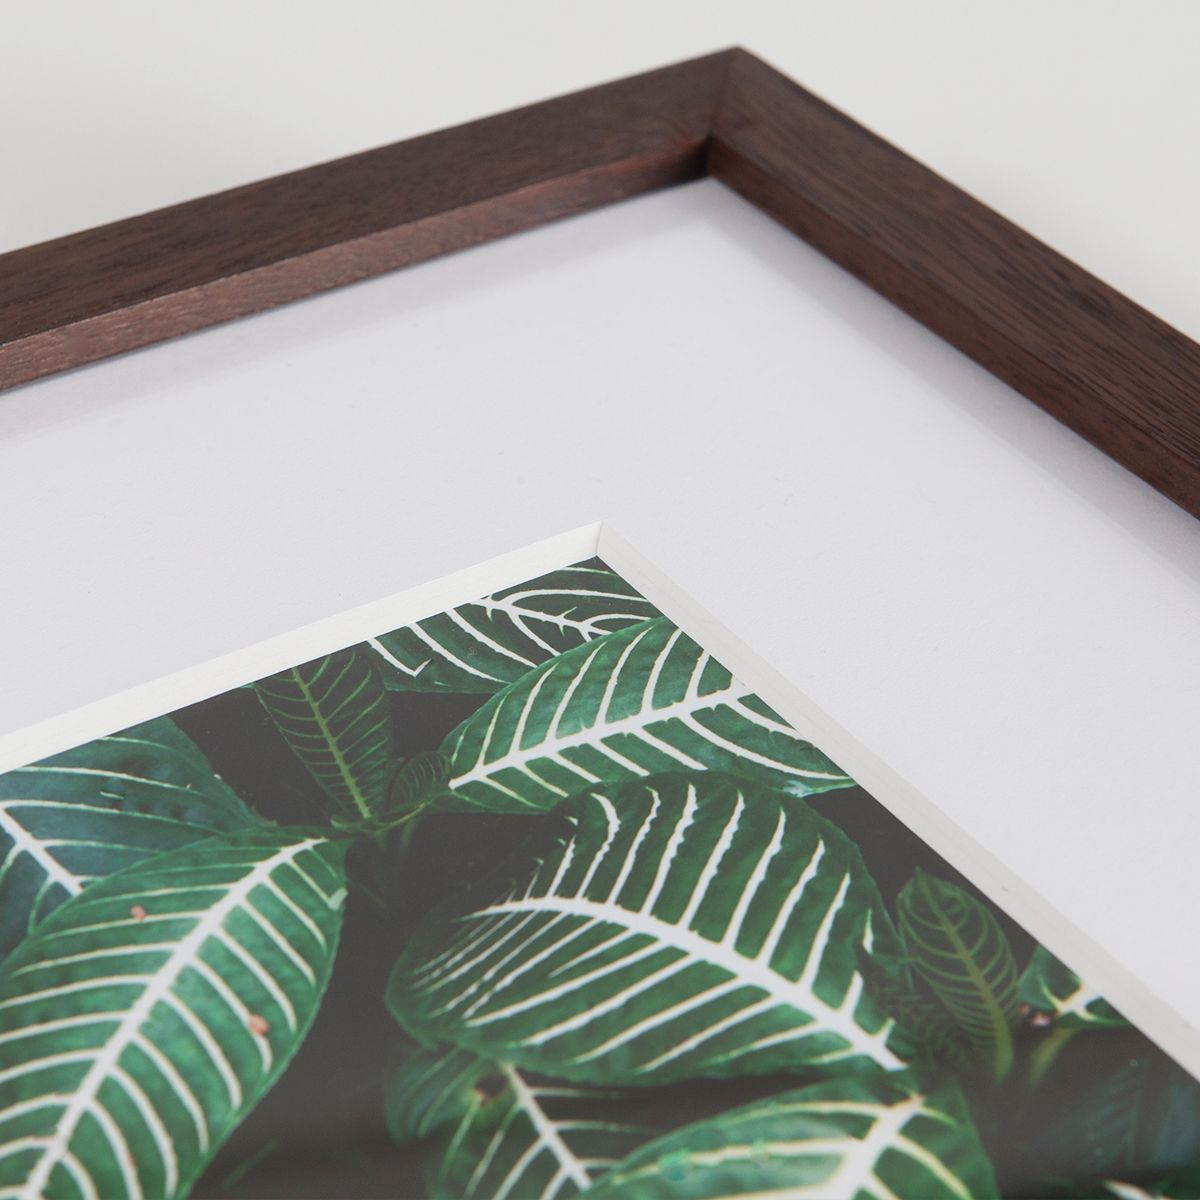 gallery-frame-main05-mat-cut-detail_2x.jpg